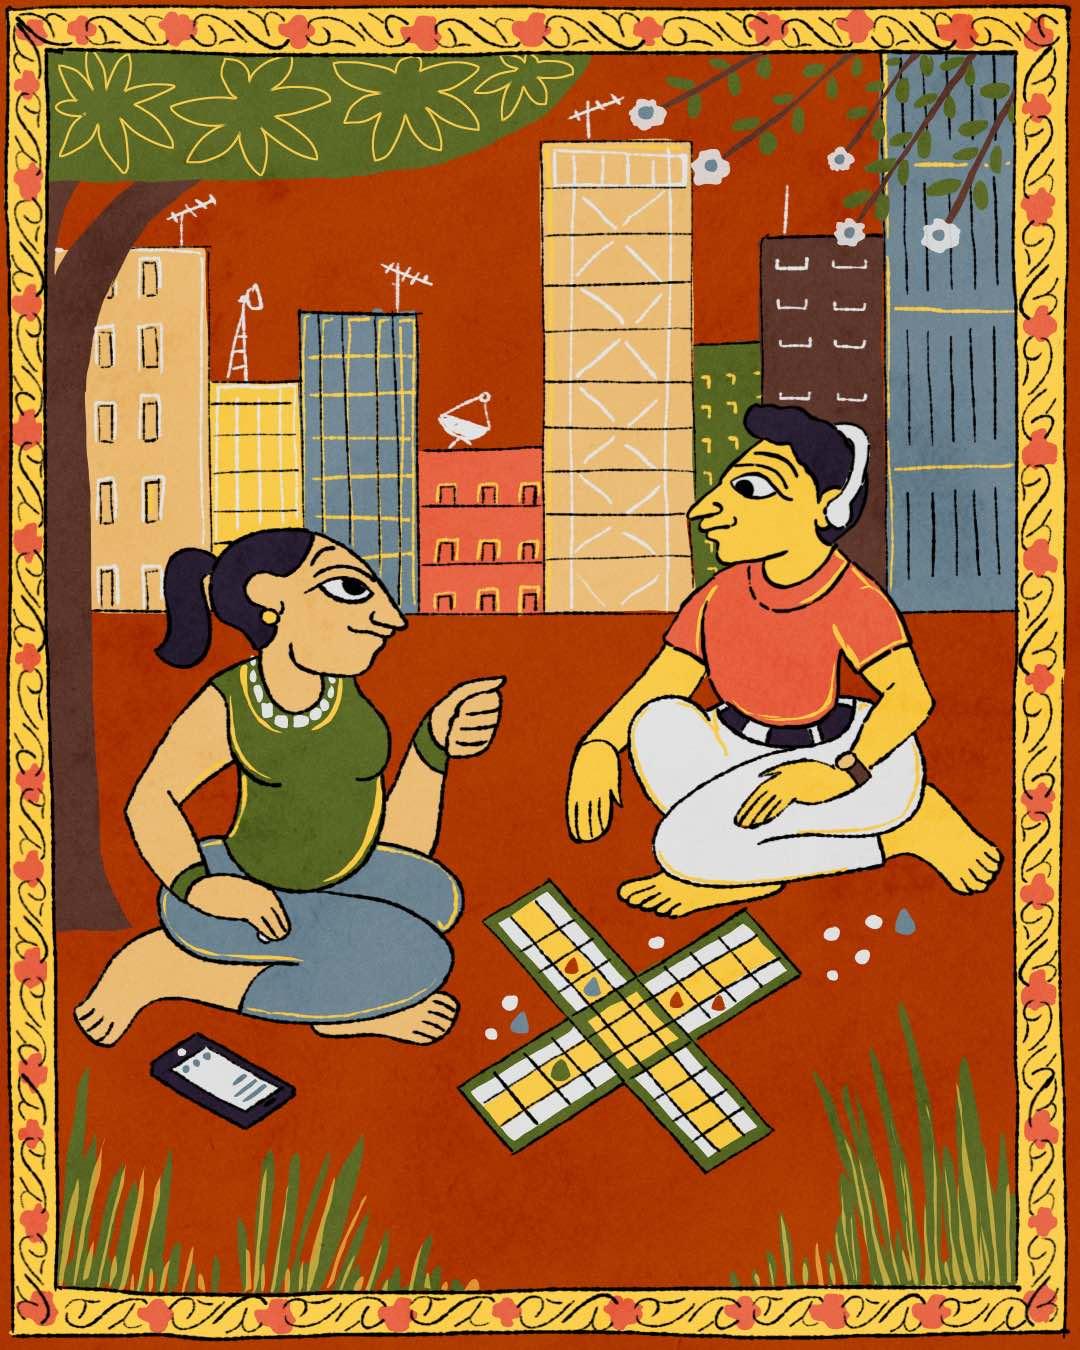 Traditional board games in India 20 Nov 18